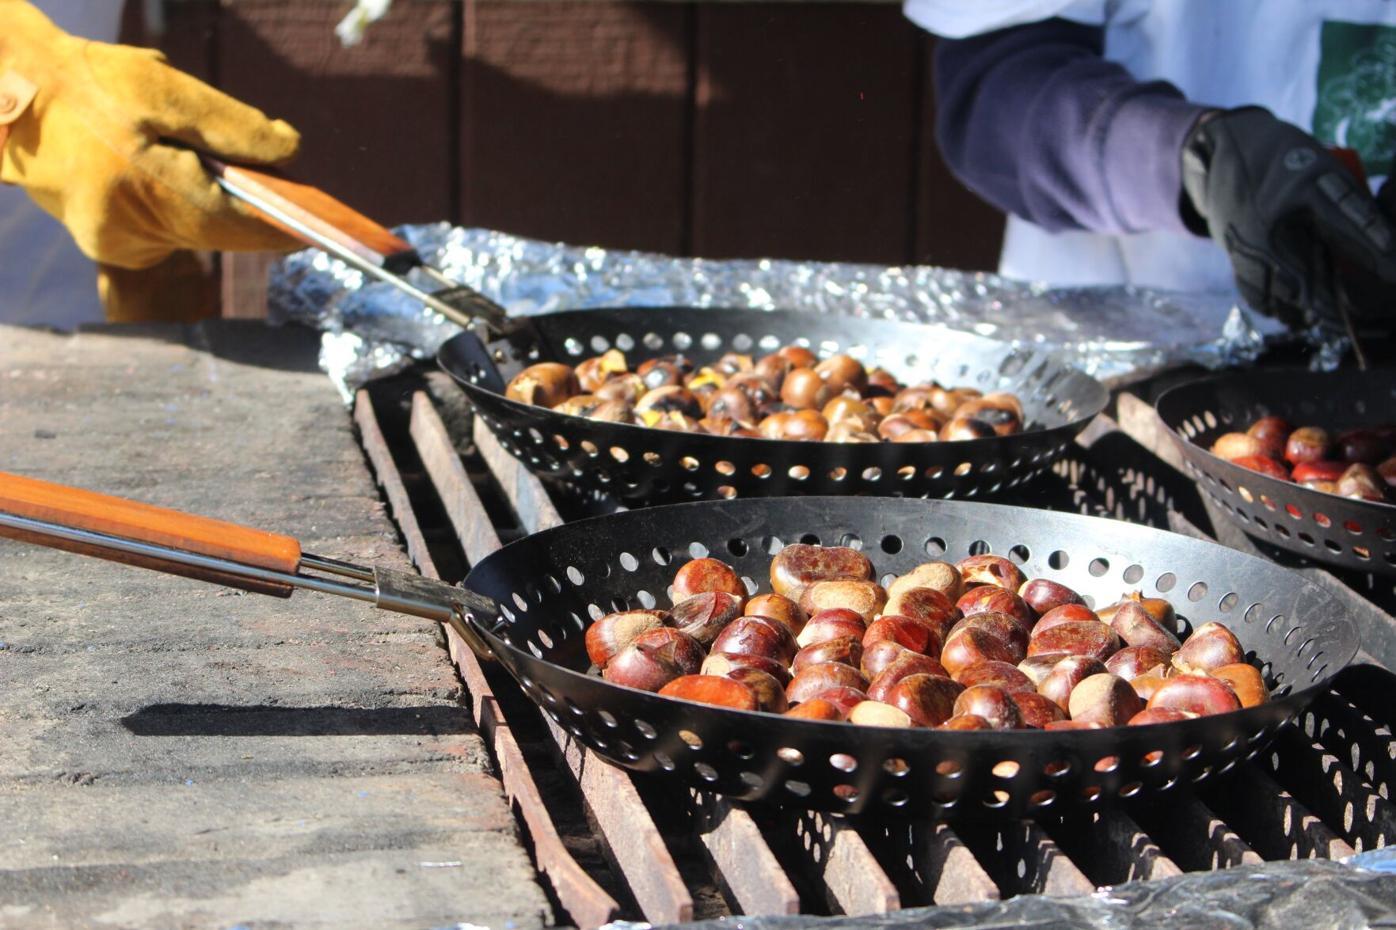 Chestnut pans